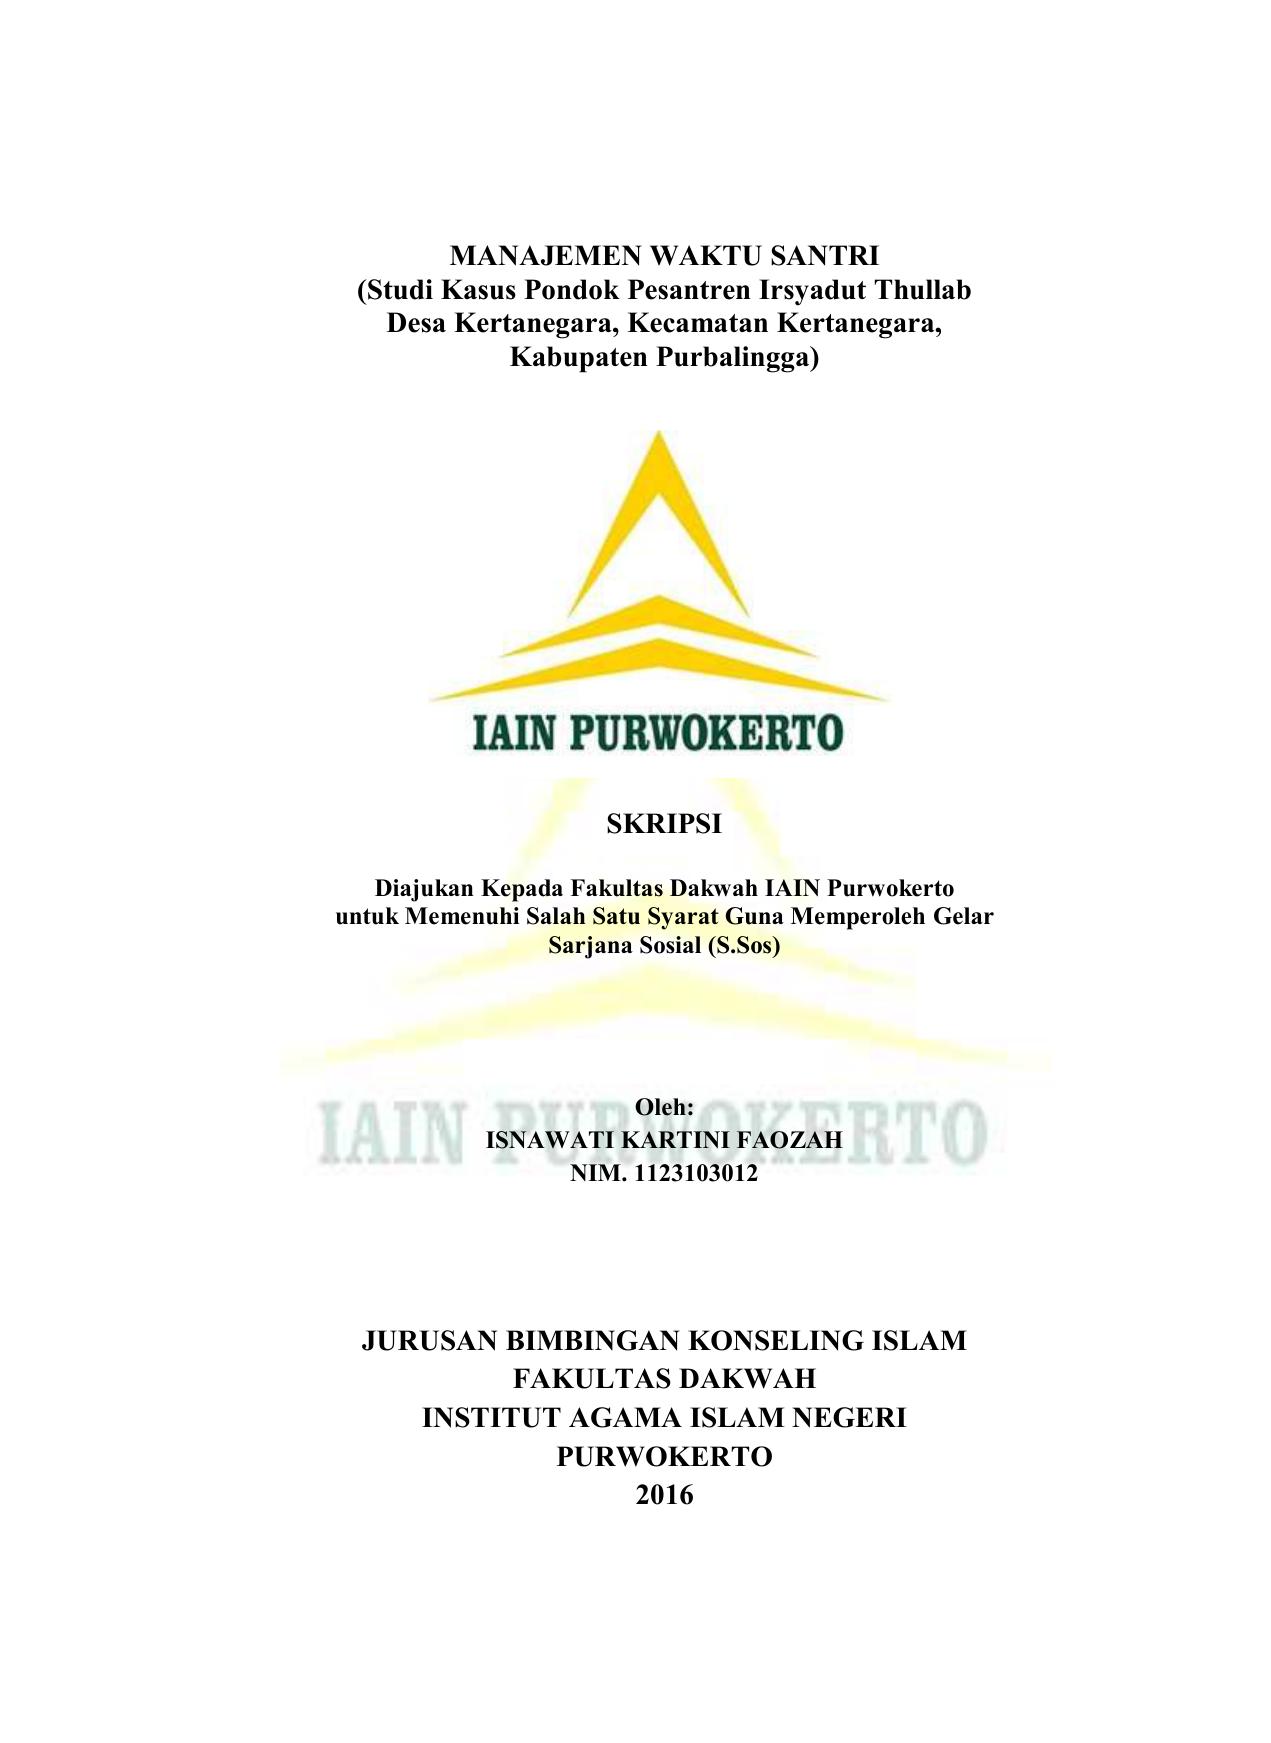 Manajemen Waktu Santri Repository Iain Purwokerto